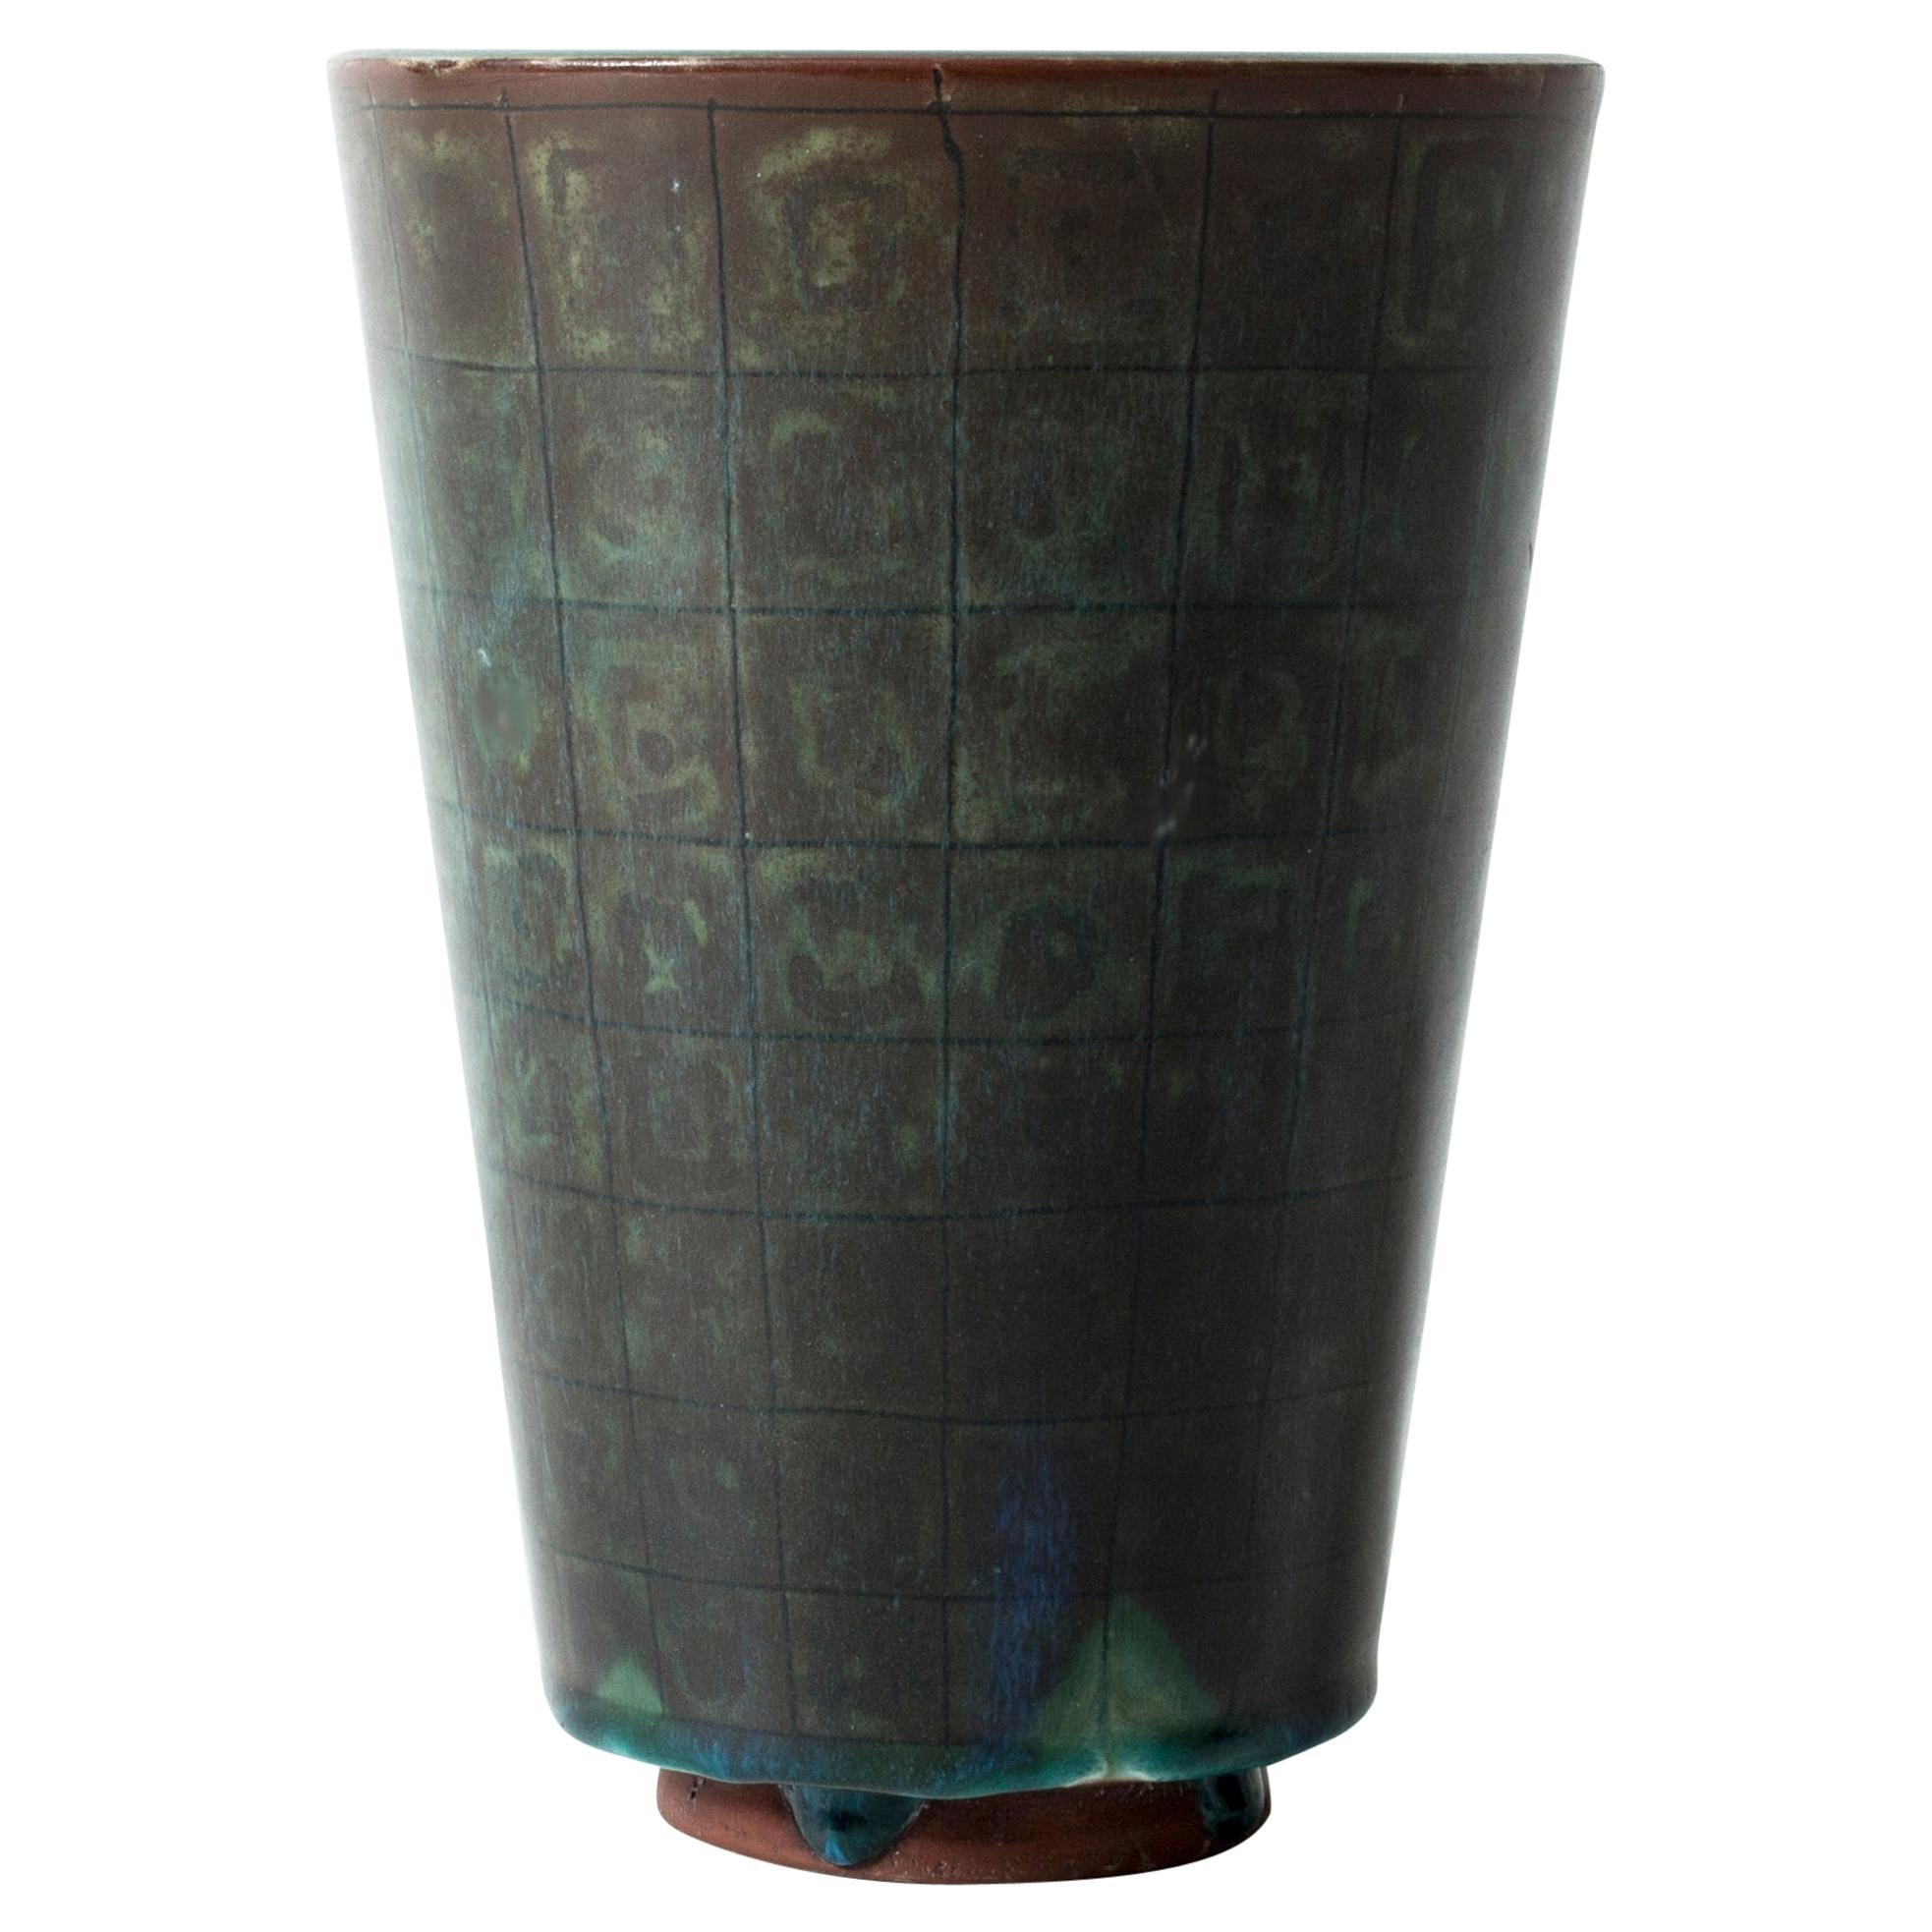 "Stoneware ""Farsta"" Vase by Wilhelm Kåge for Gustavsberg, Sweden, 1940s"